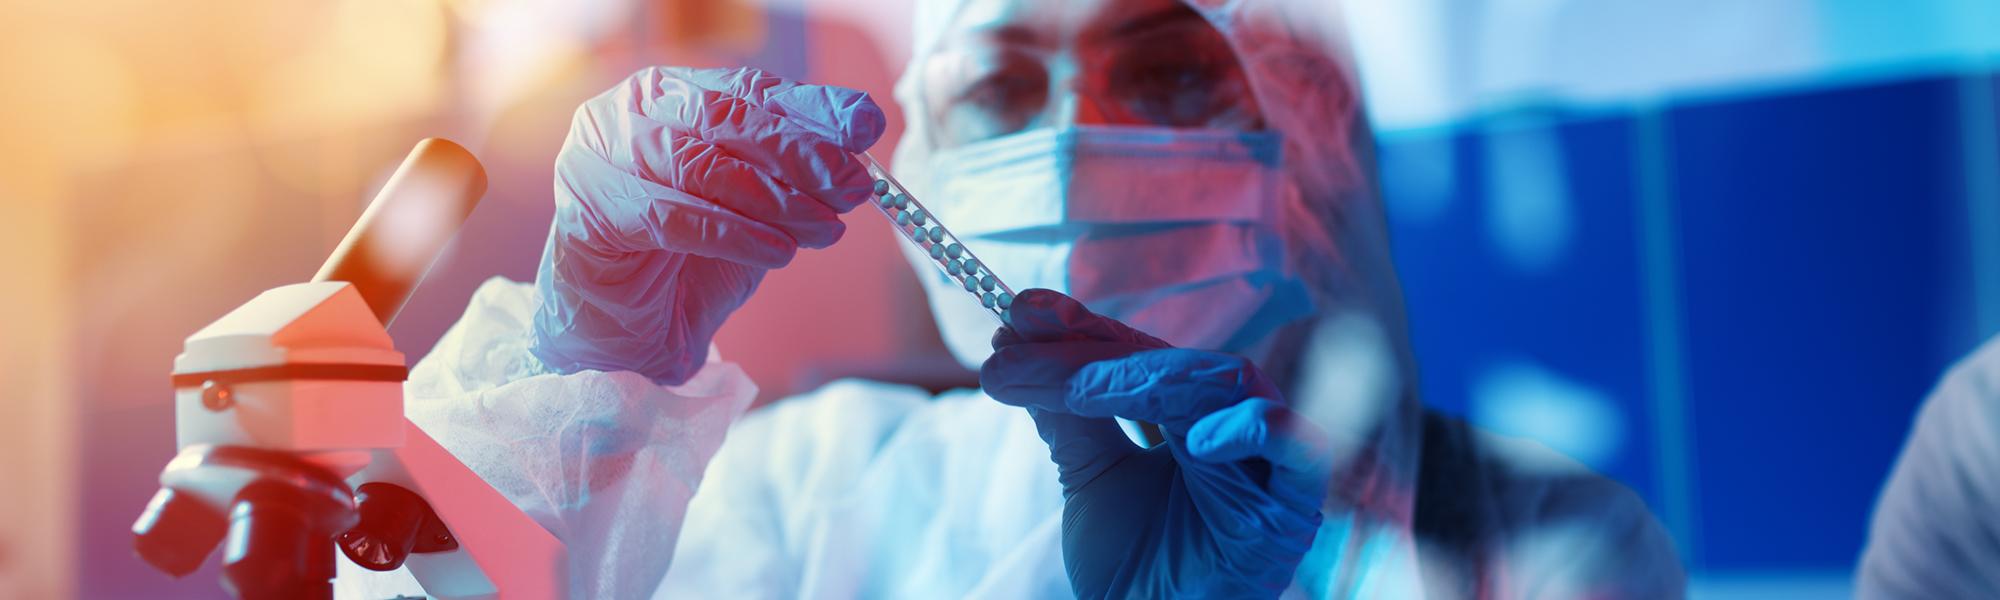 Medical science laboratory.